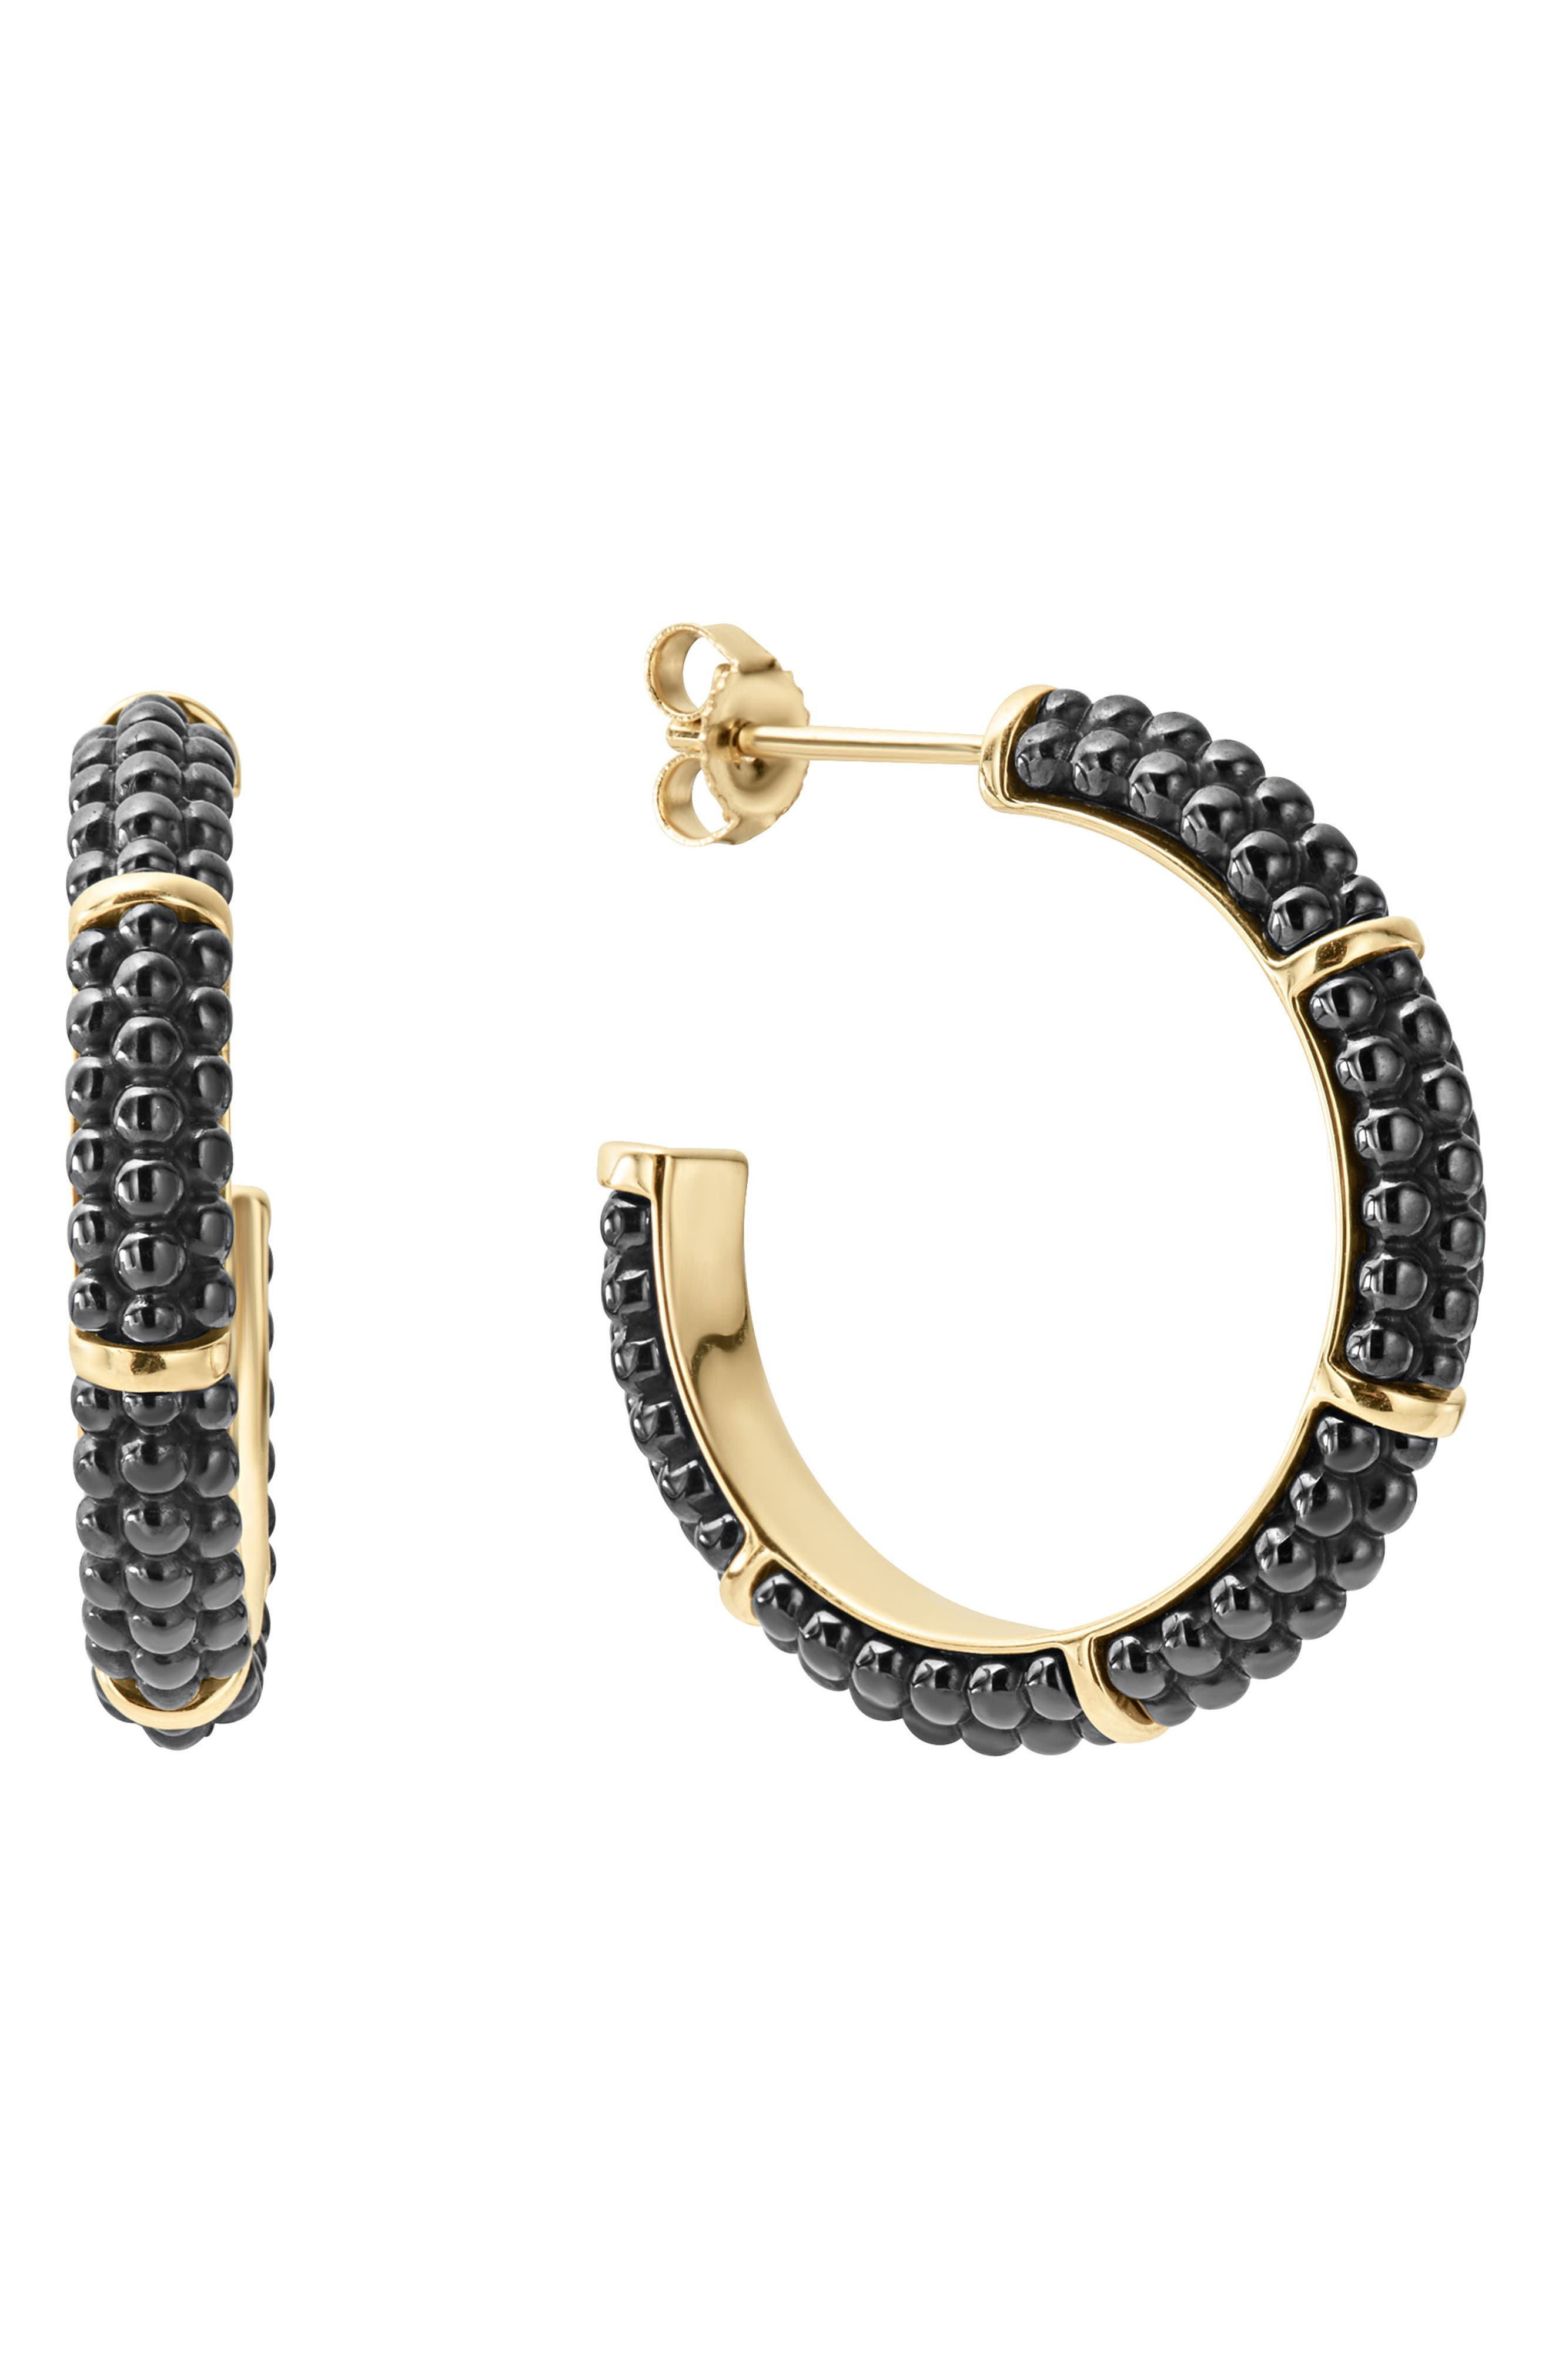 Gold & Black Caviar Hoop Earrings,                         Main,                         color, GOLD